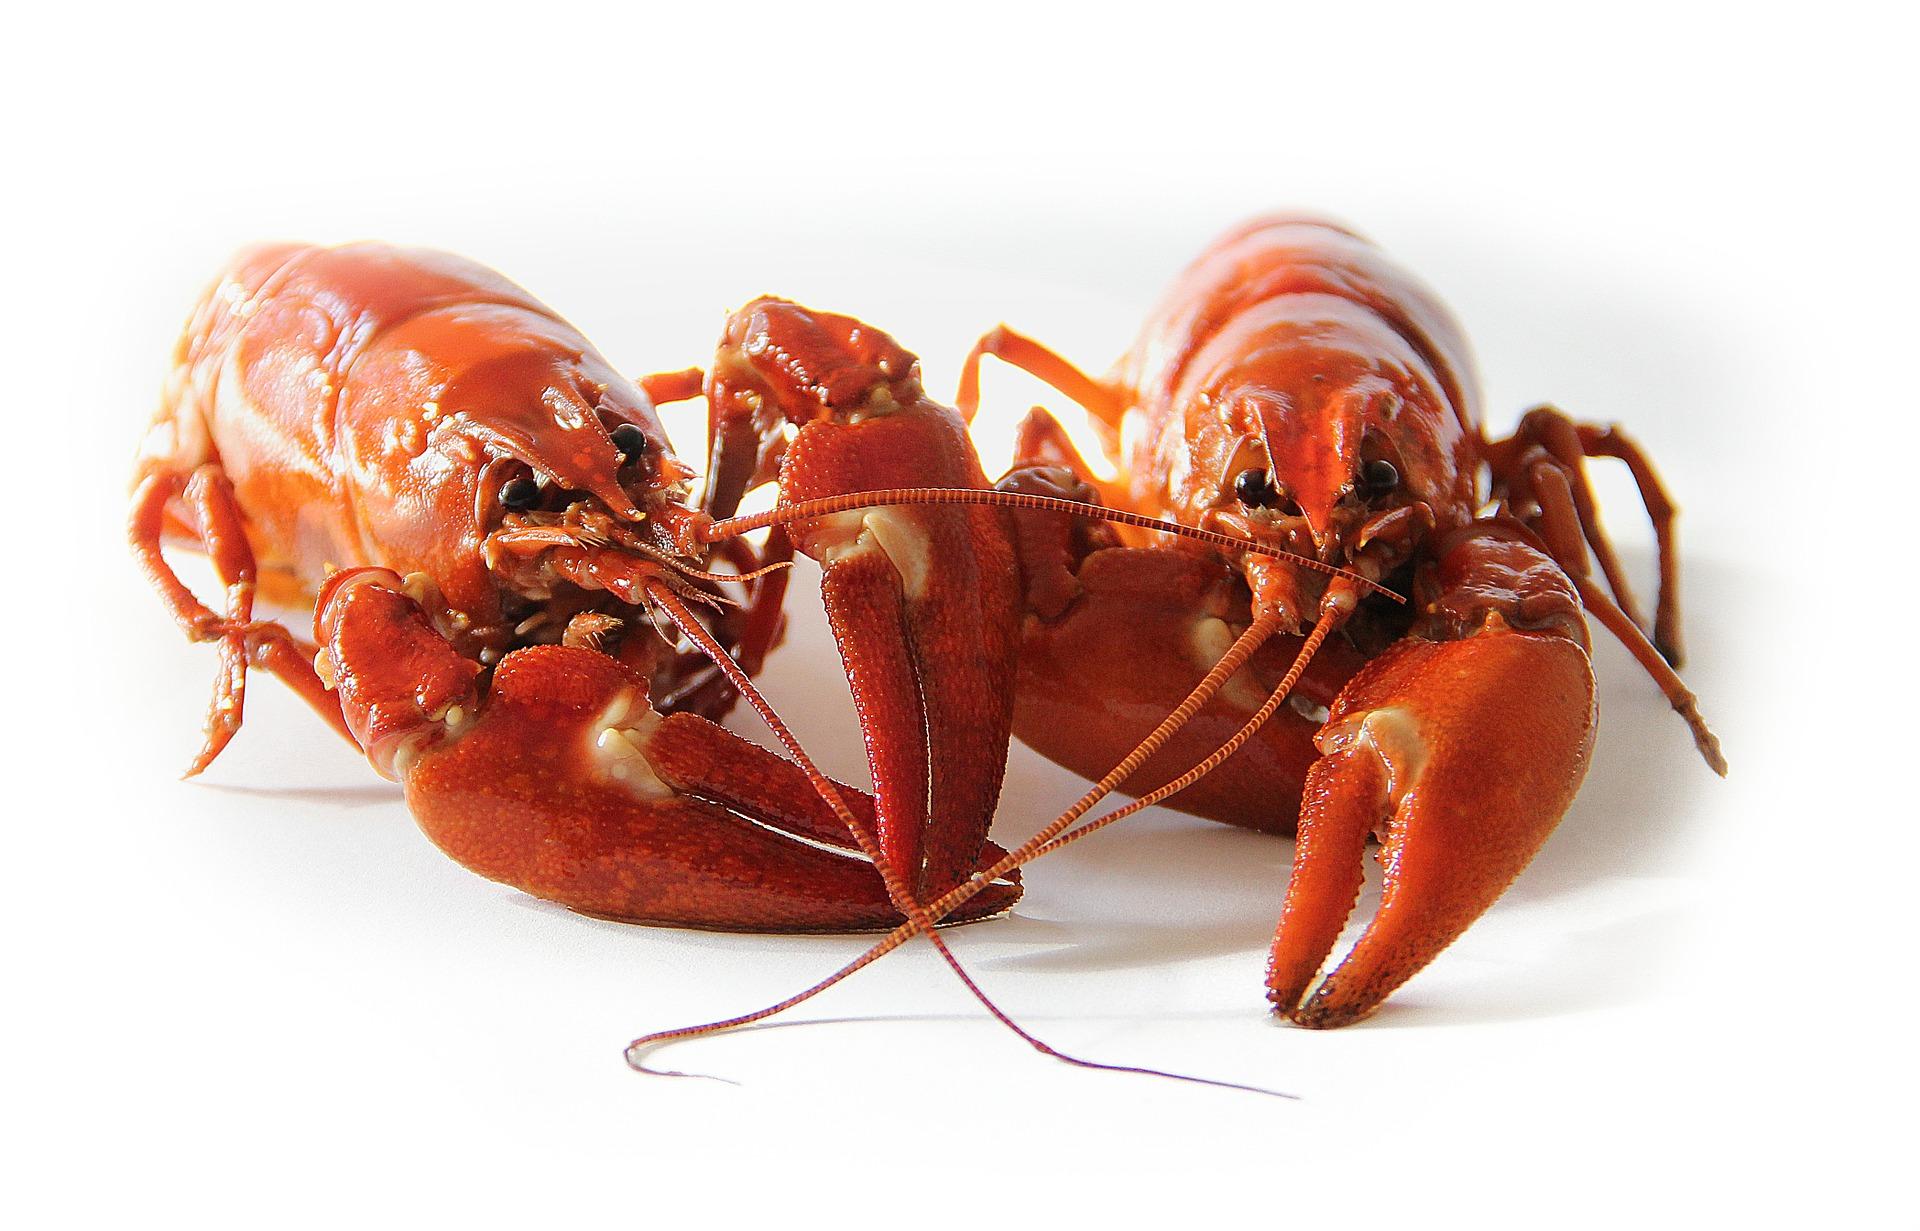 crayfish-423251_1920